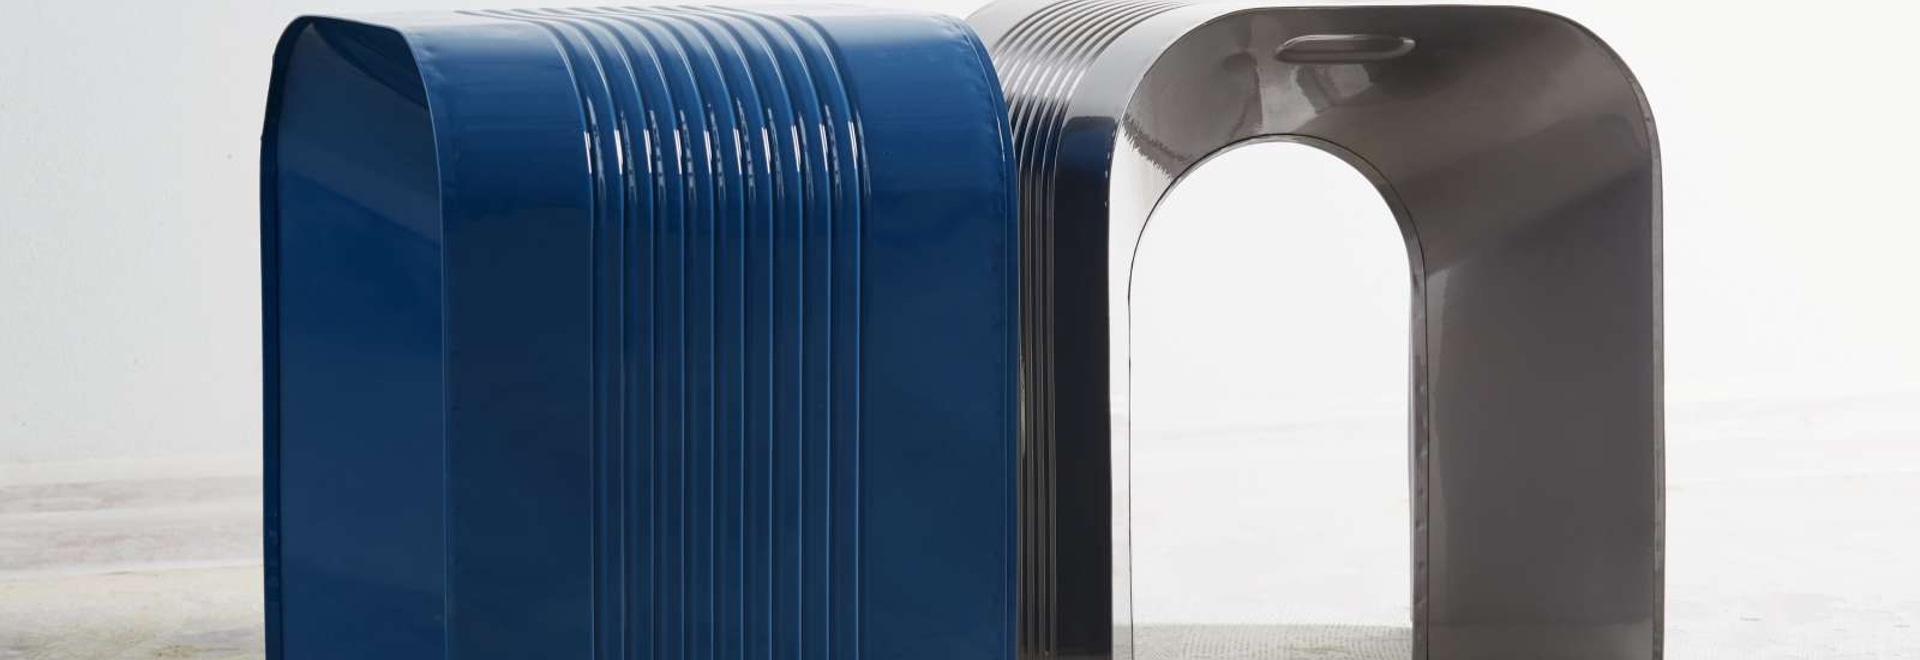 Tin Cans Were The Inspiration detrás de los taburetes 'PaperThin' por más ll'atelier